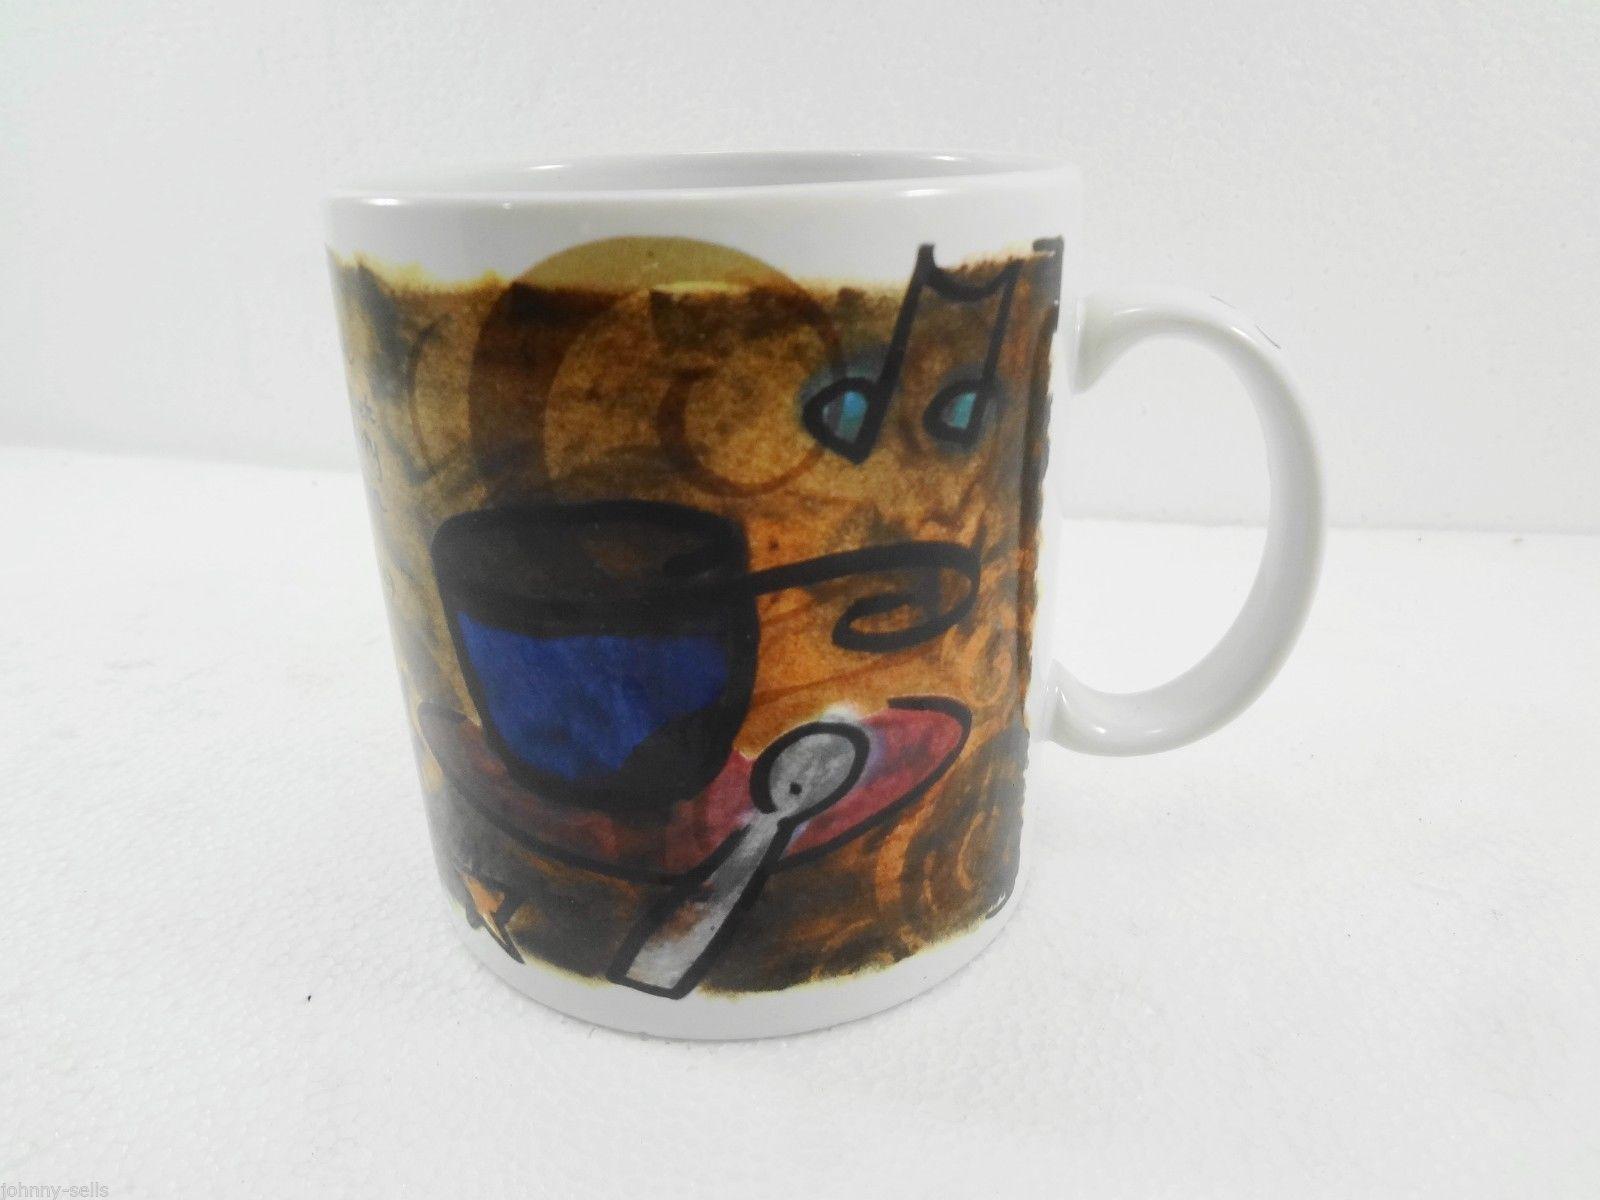 Starbucks Coffee Break Essentials Coffee Tea Mug Cup 1998 Oversize 16 oz